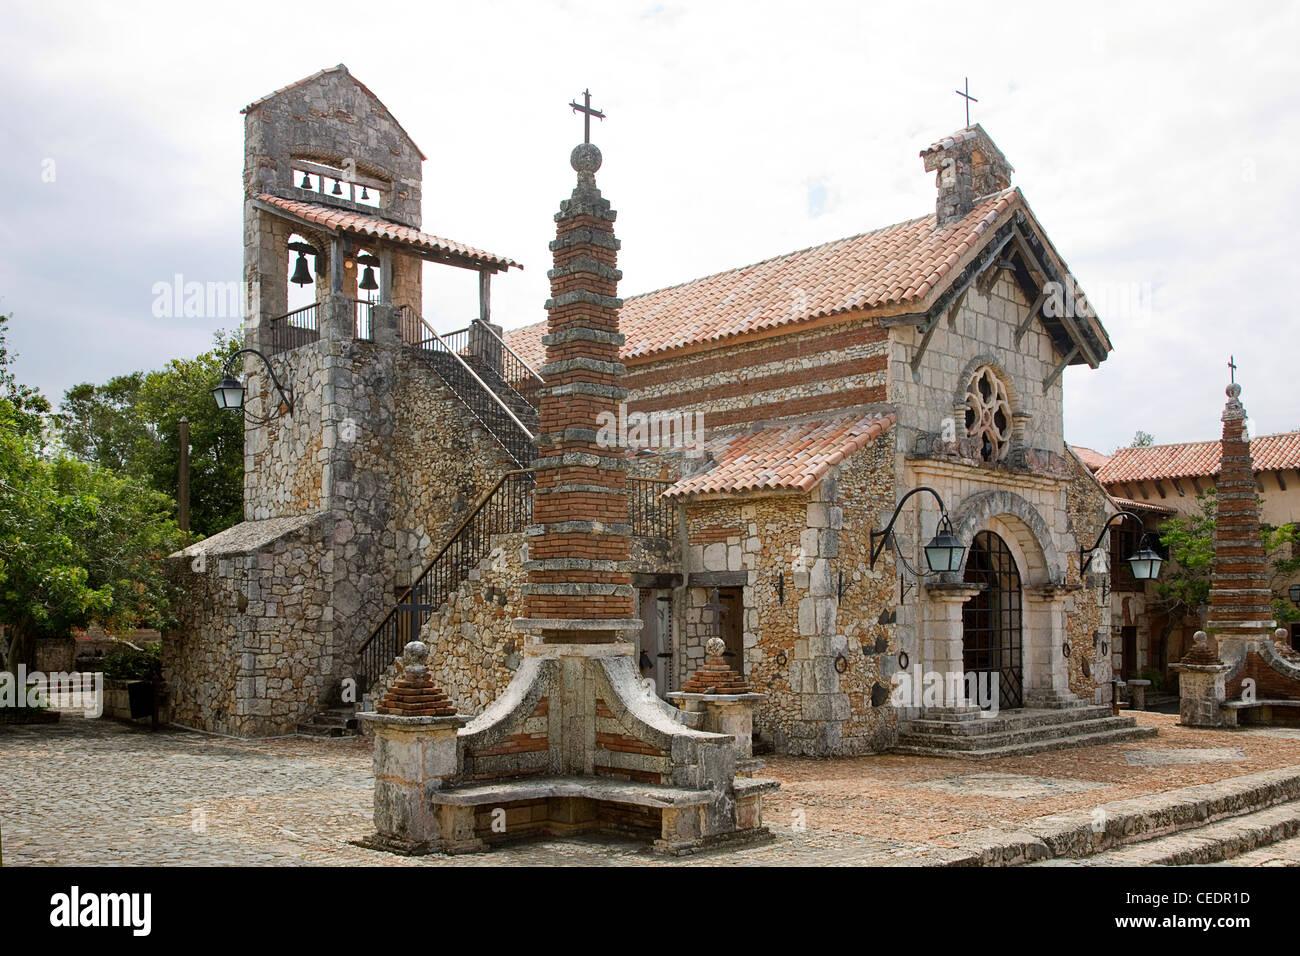 Dominican Republic, Altos de Chavon, St Stanislaus Church, exterior - Stock Image